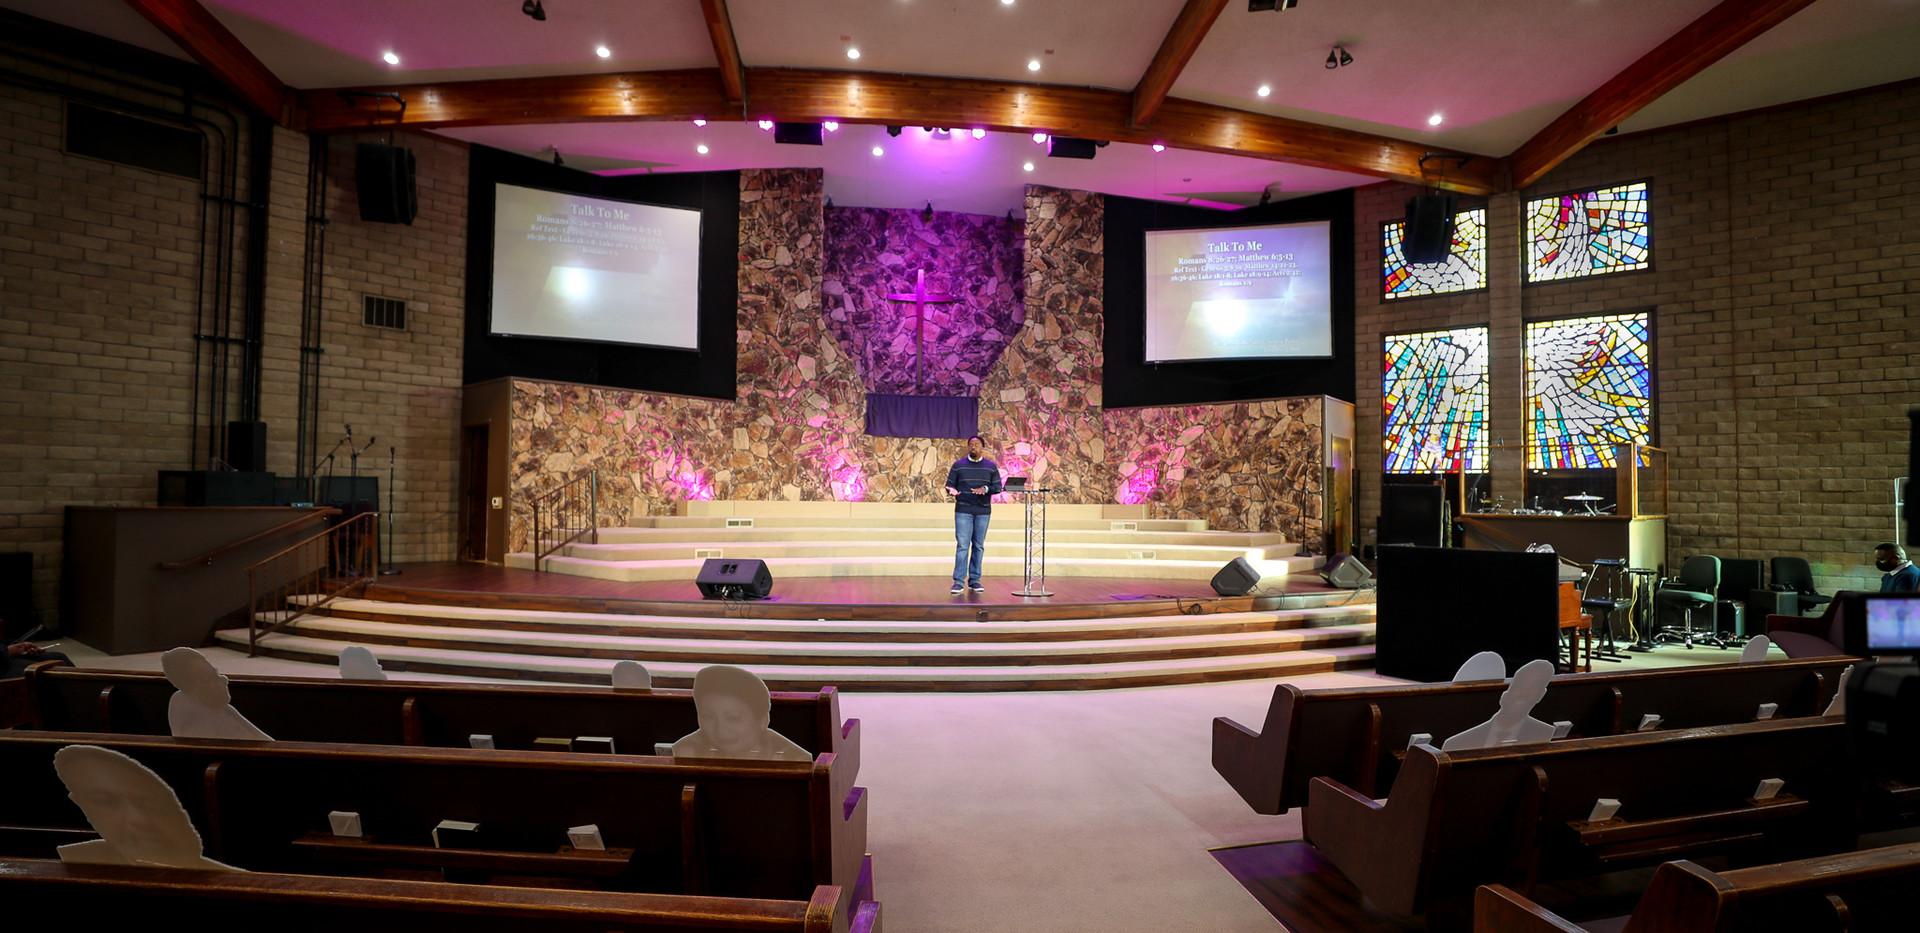 1/17/21 - Emmanuel Baptist Church - San Jose, CA - 4